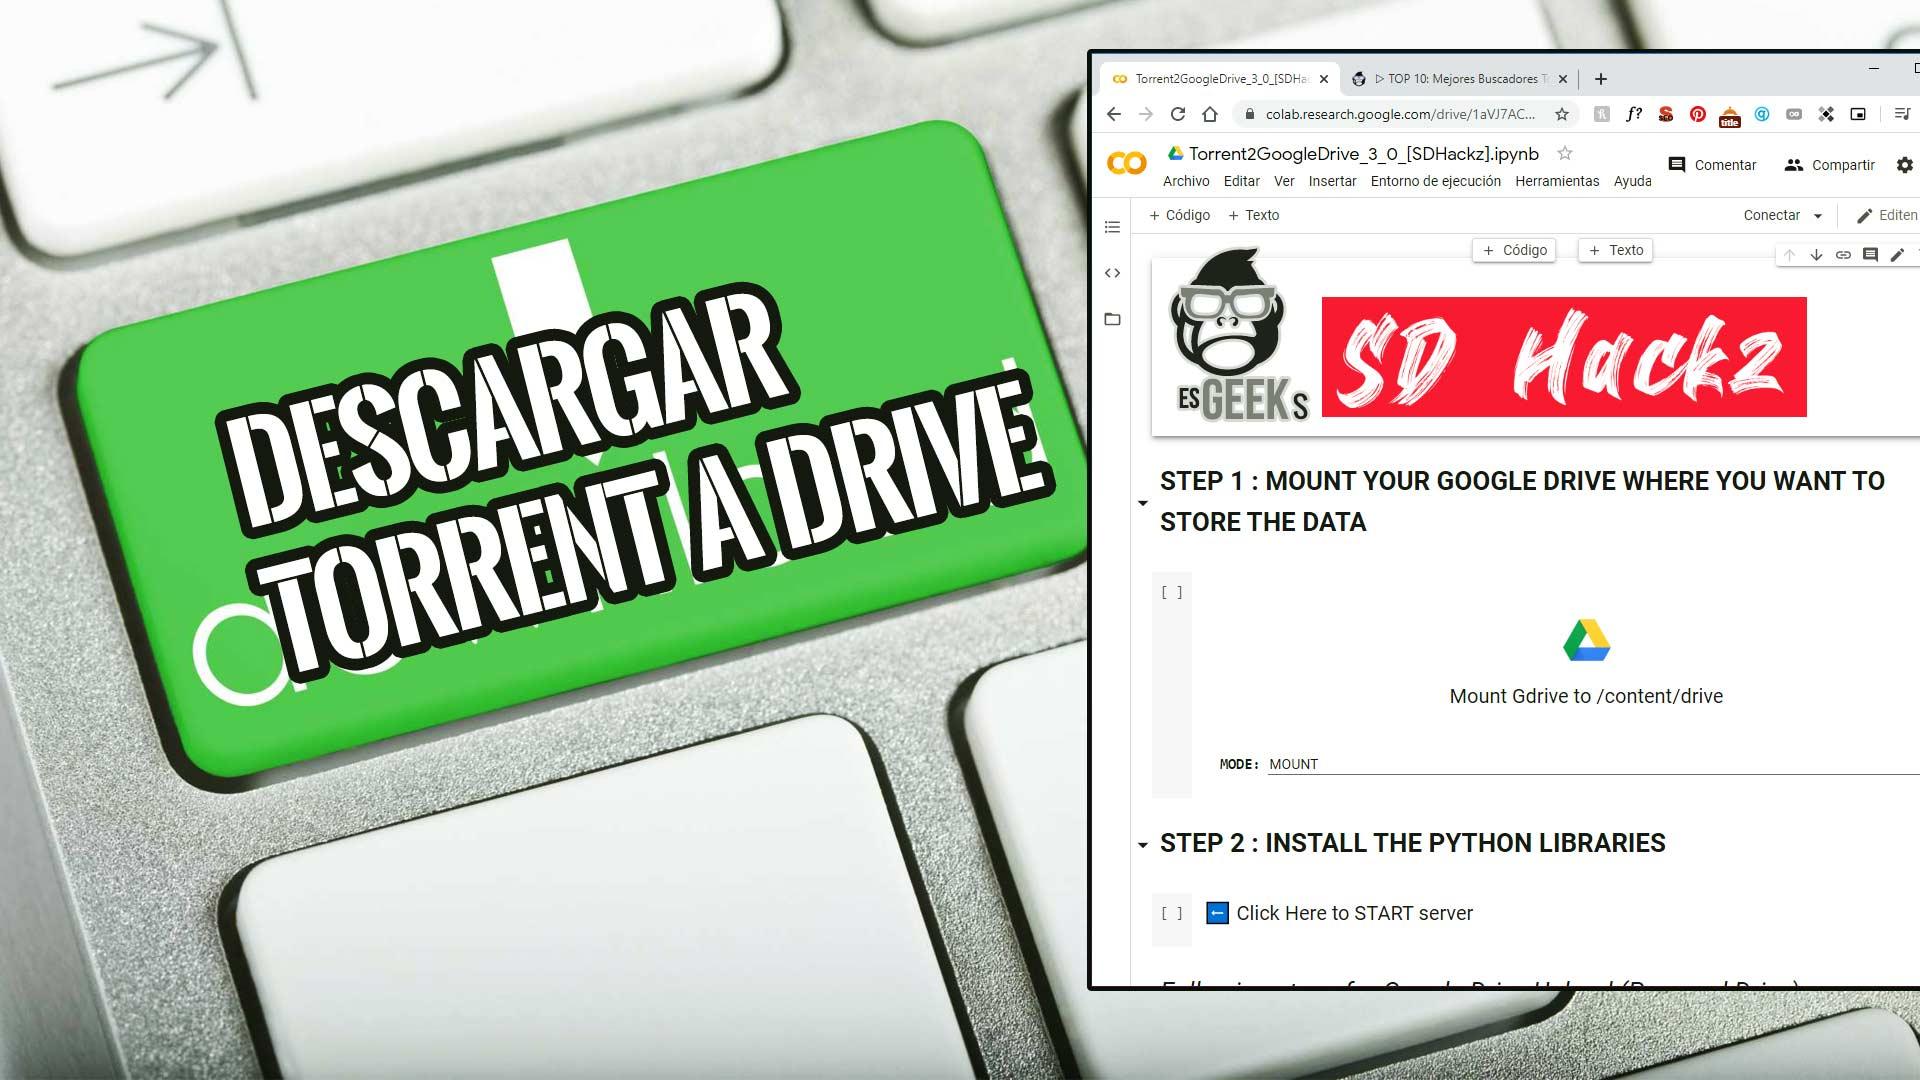 Download Torrent to Google Drive